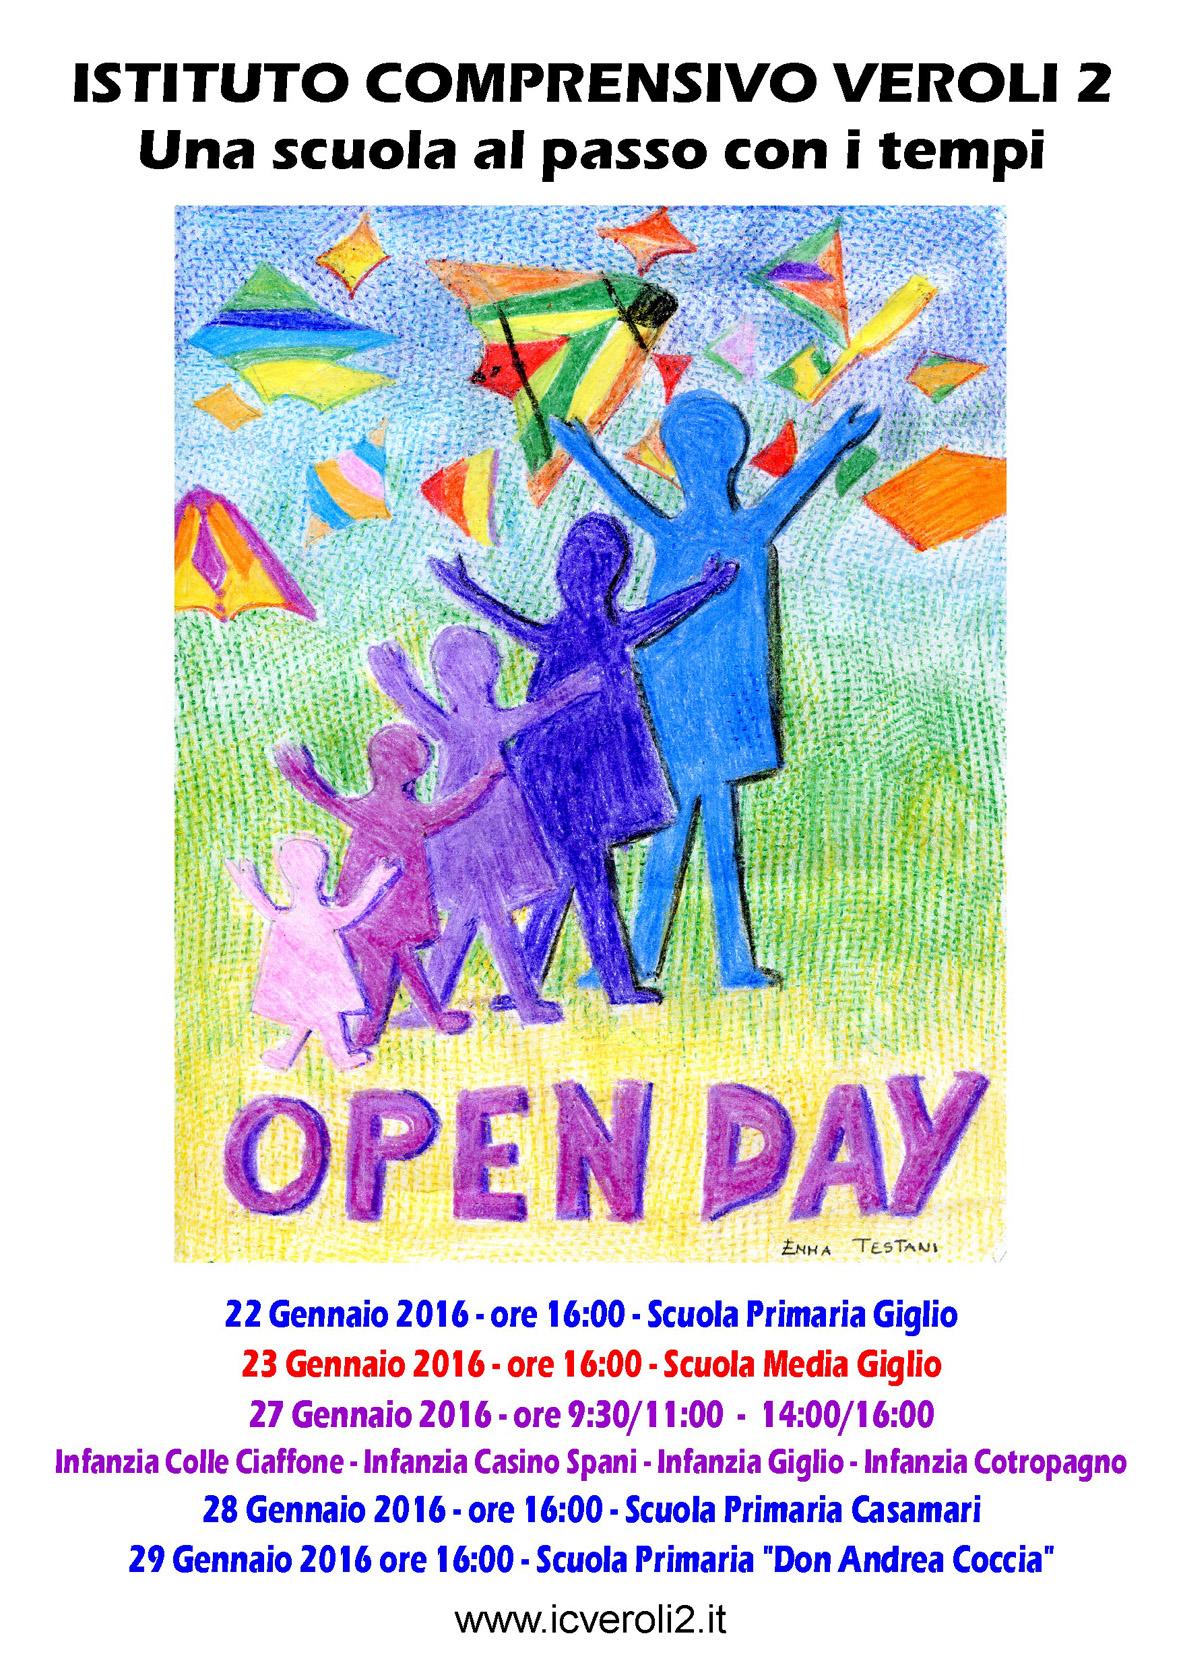 OpenDay Veroli